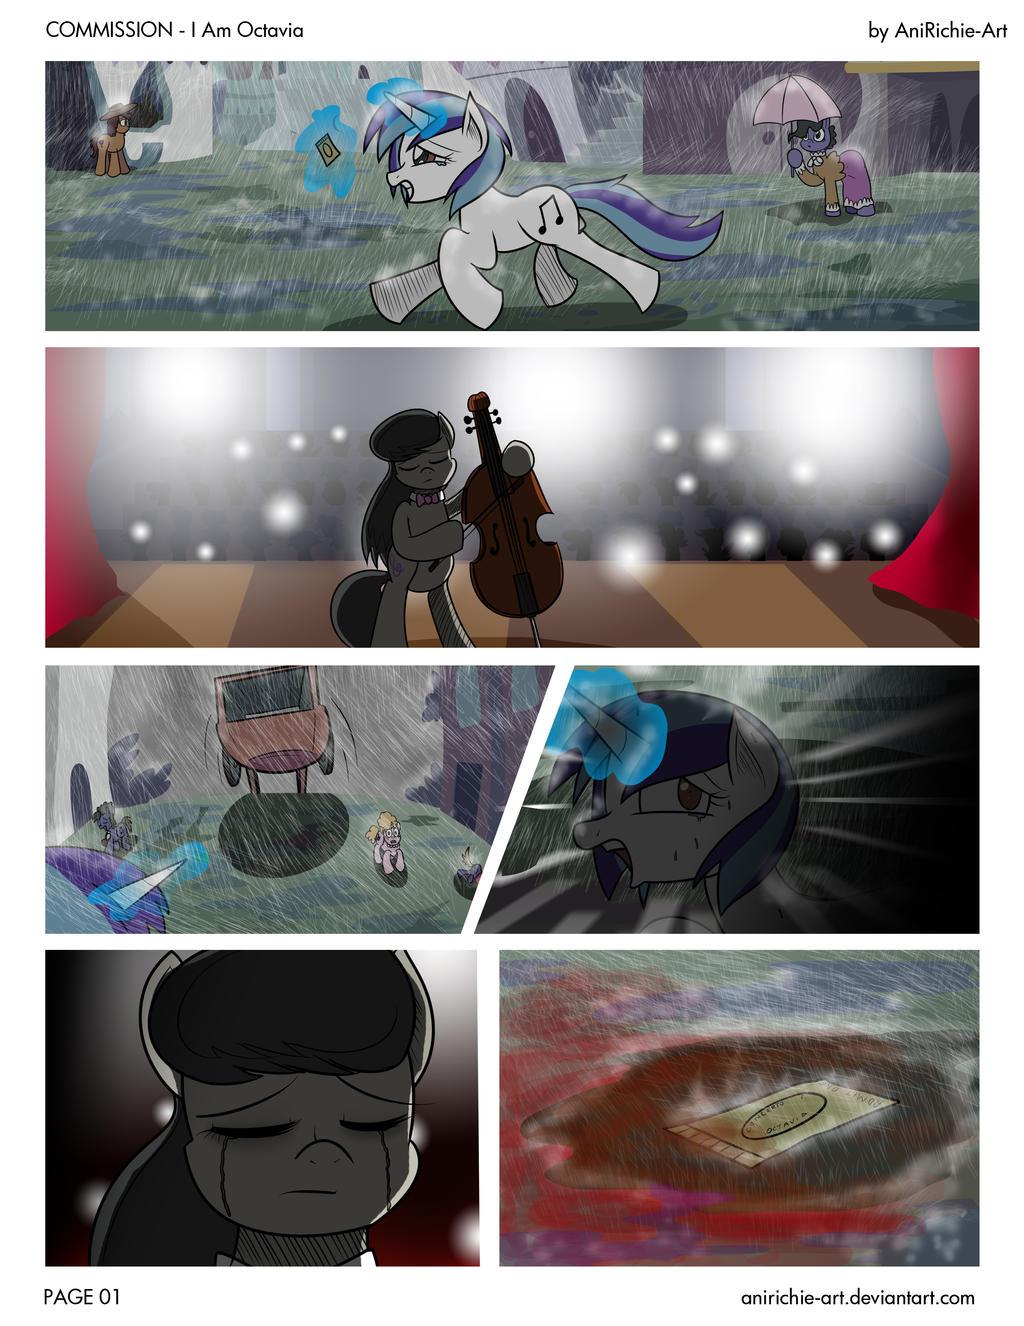 Encore: I am Octavia - PAGE 01 (COMIC)